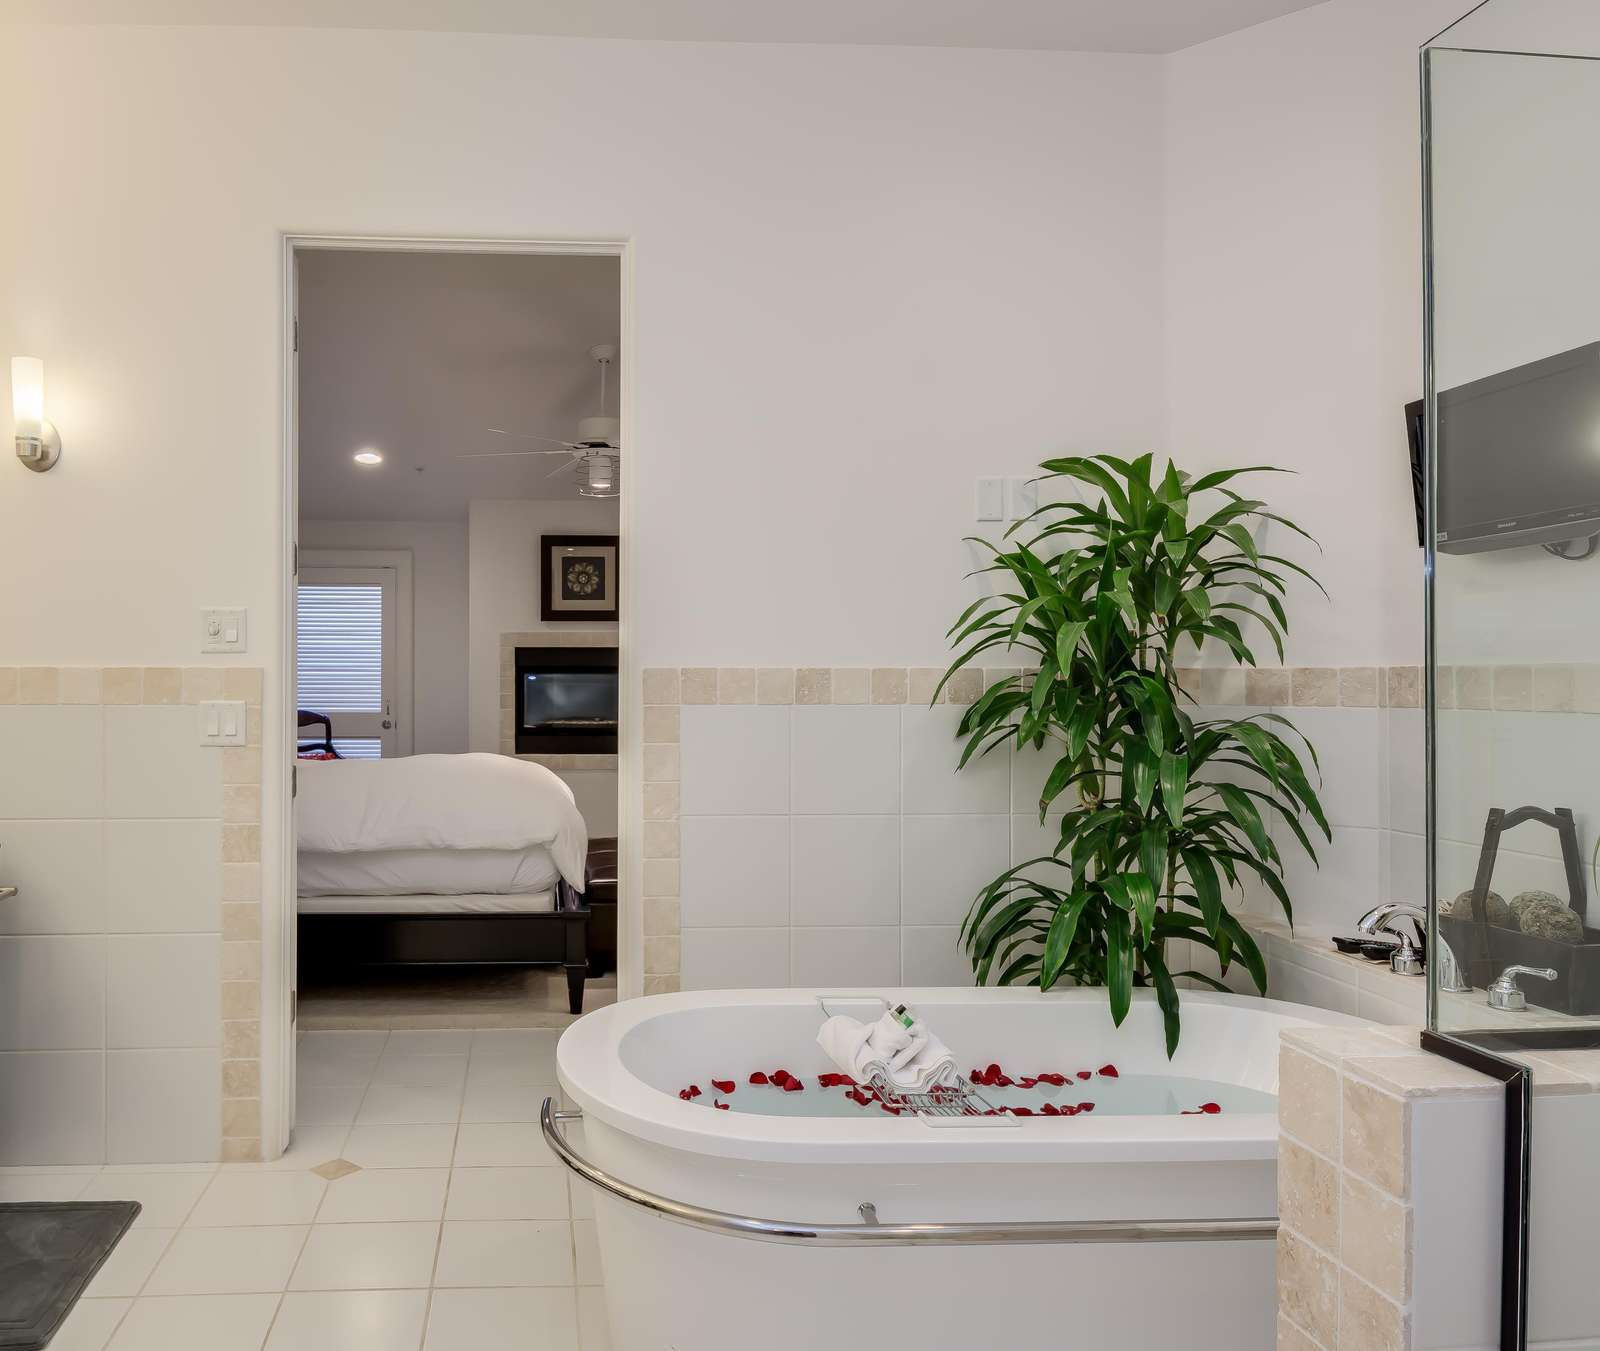 Luxury Bathroom for a Relaxing Weekend!